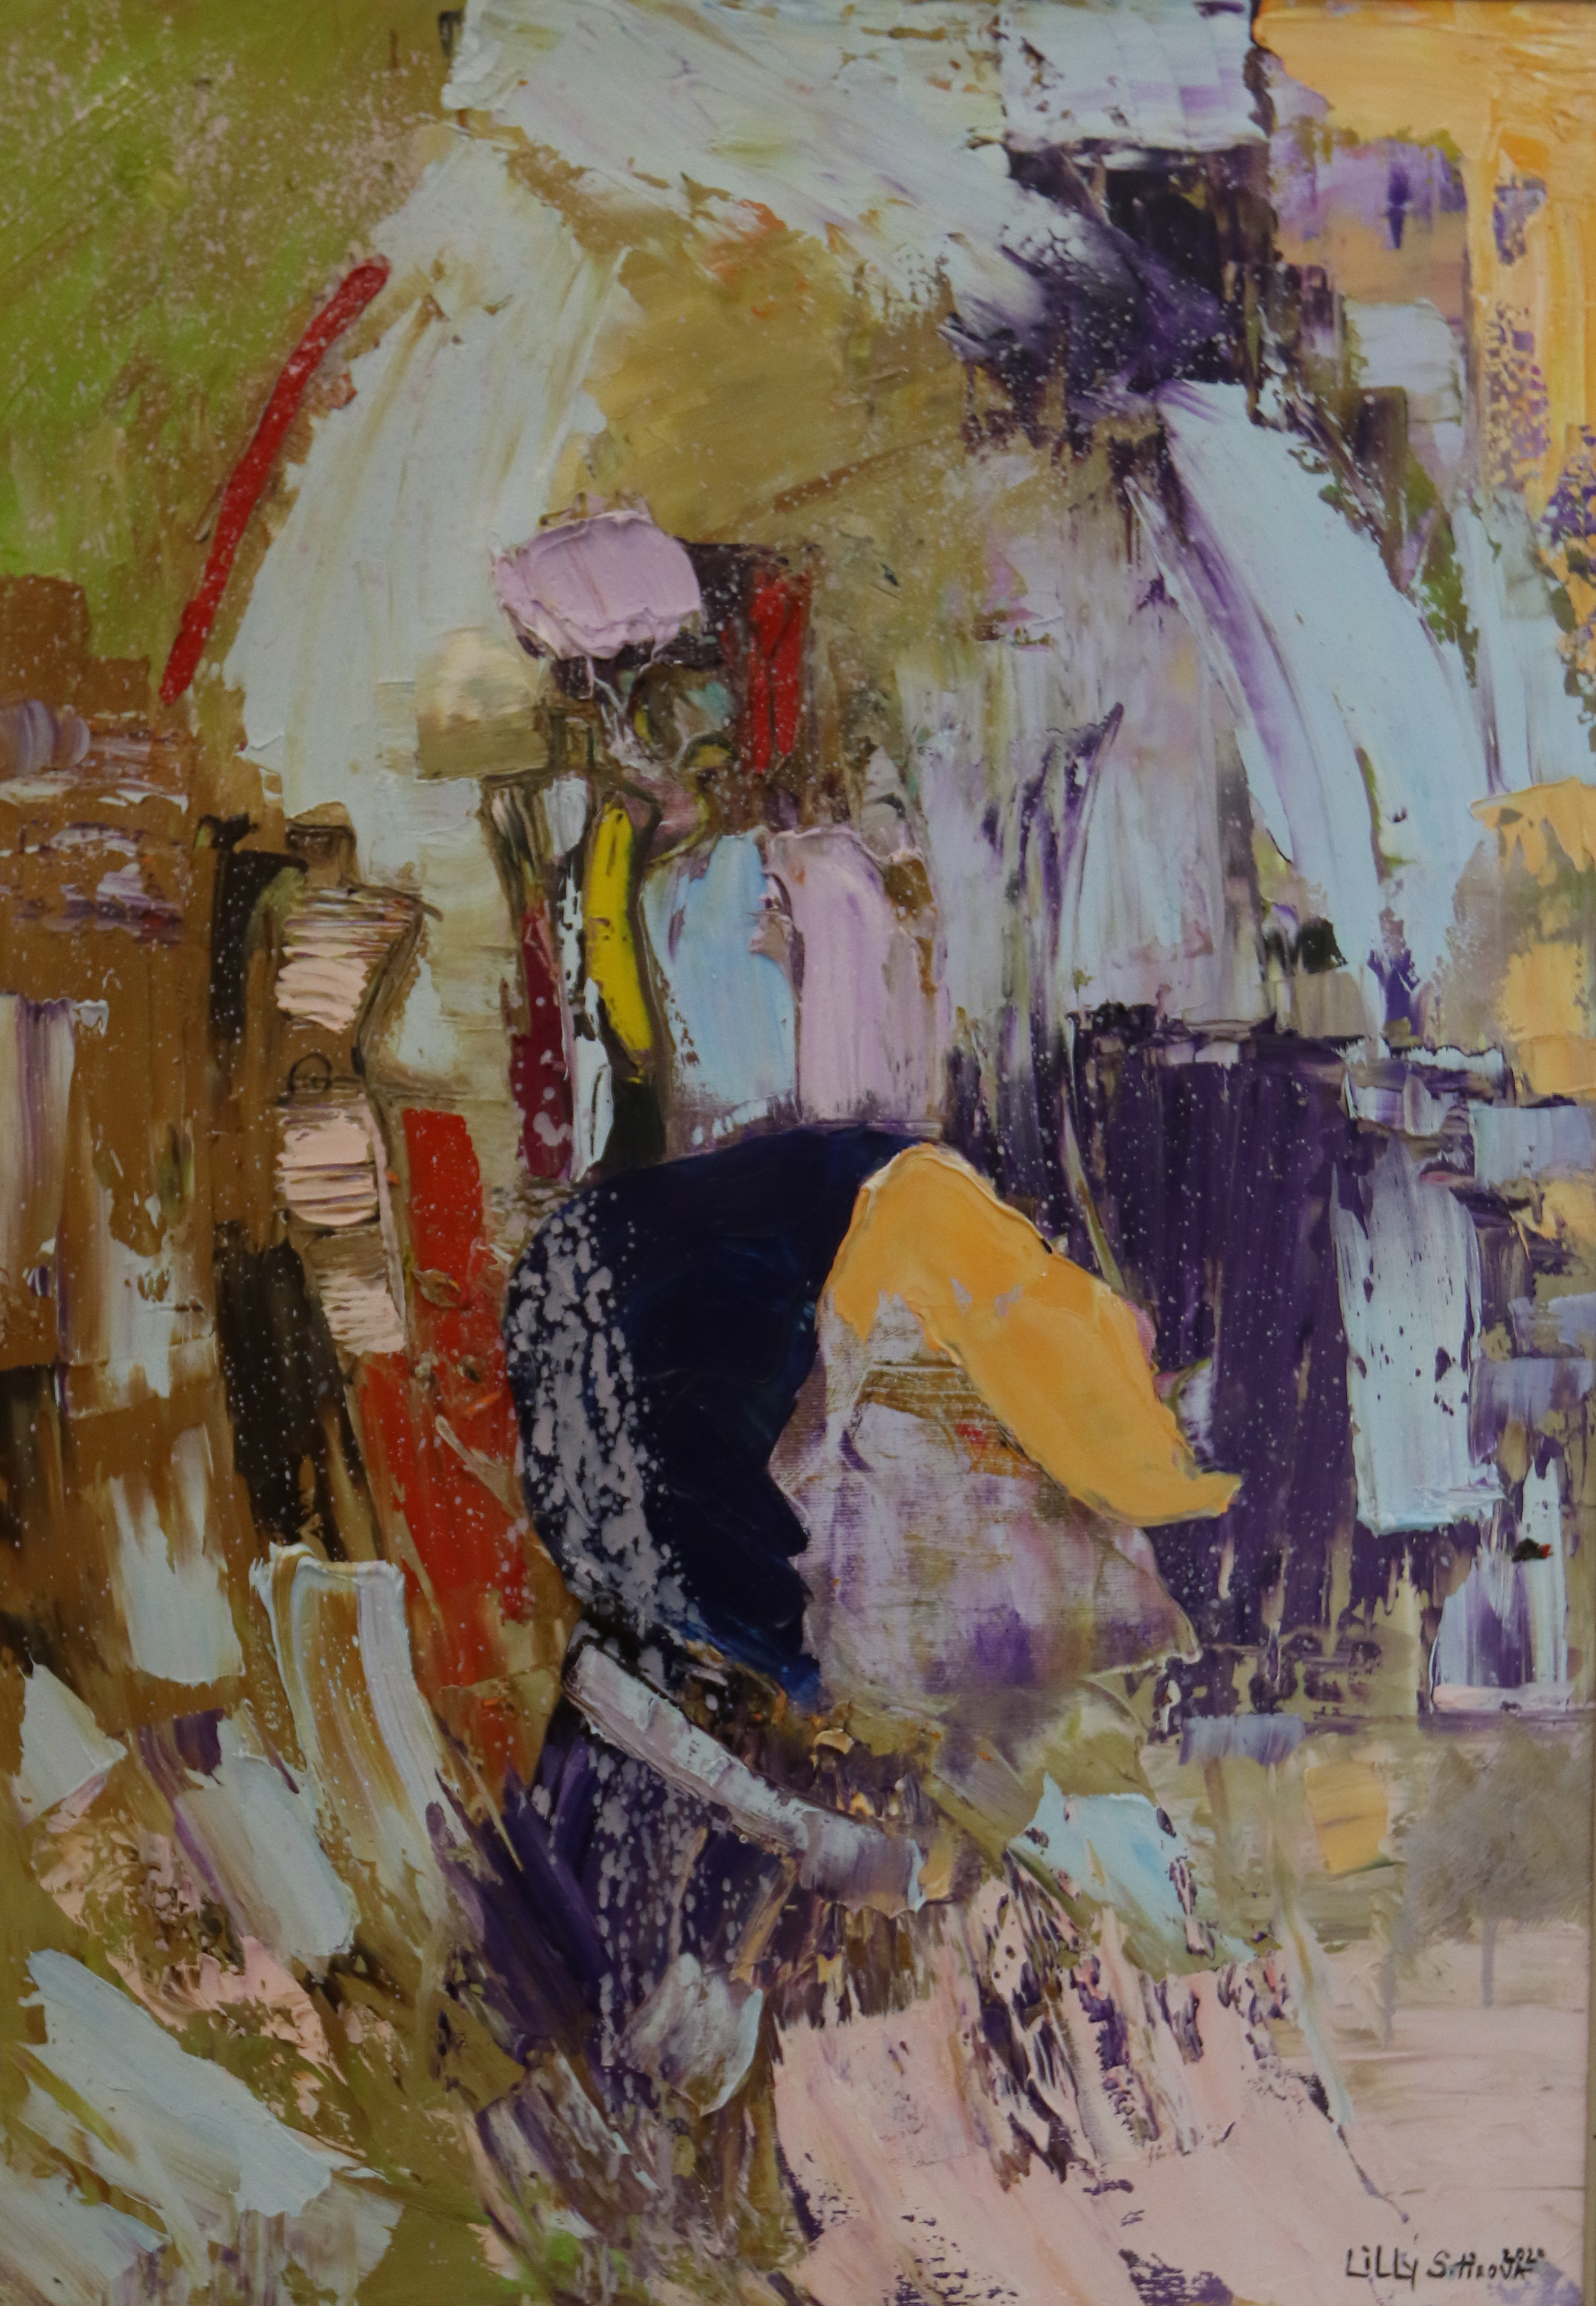 <p>Изложба живопис &bdquo;Презареждане&ldquo; от Лили Сотирова, в Галерия &bdquo;Гешов&rdquo;</p>